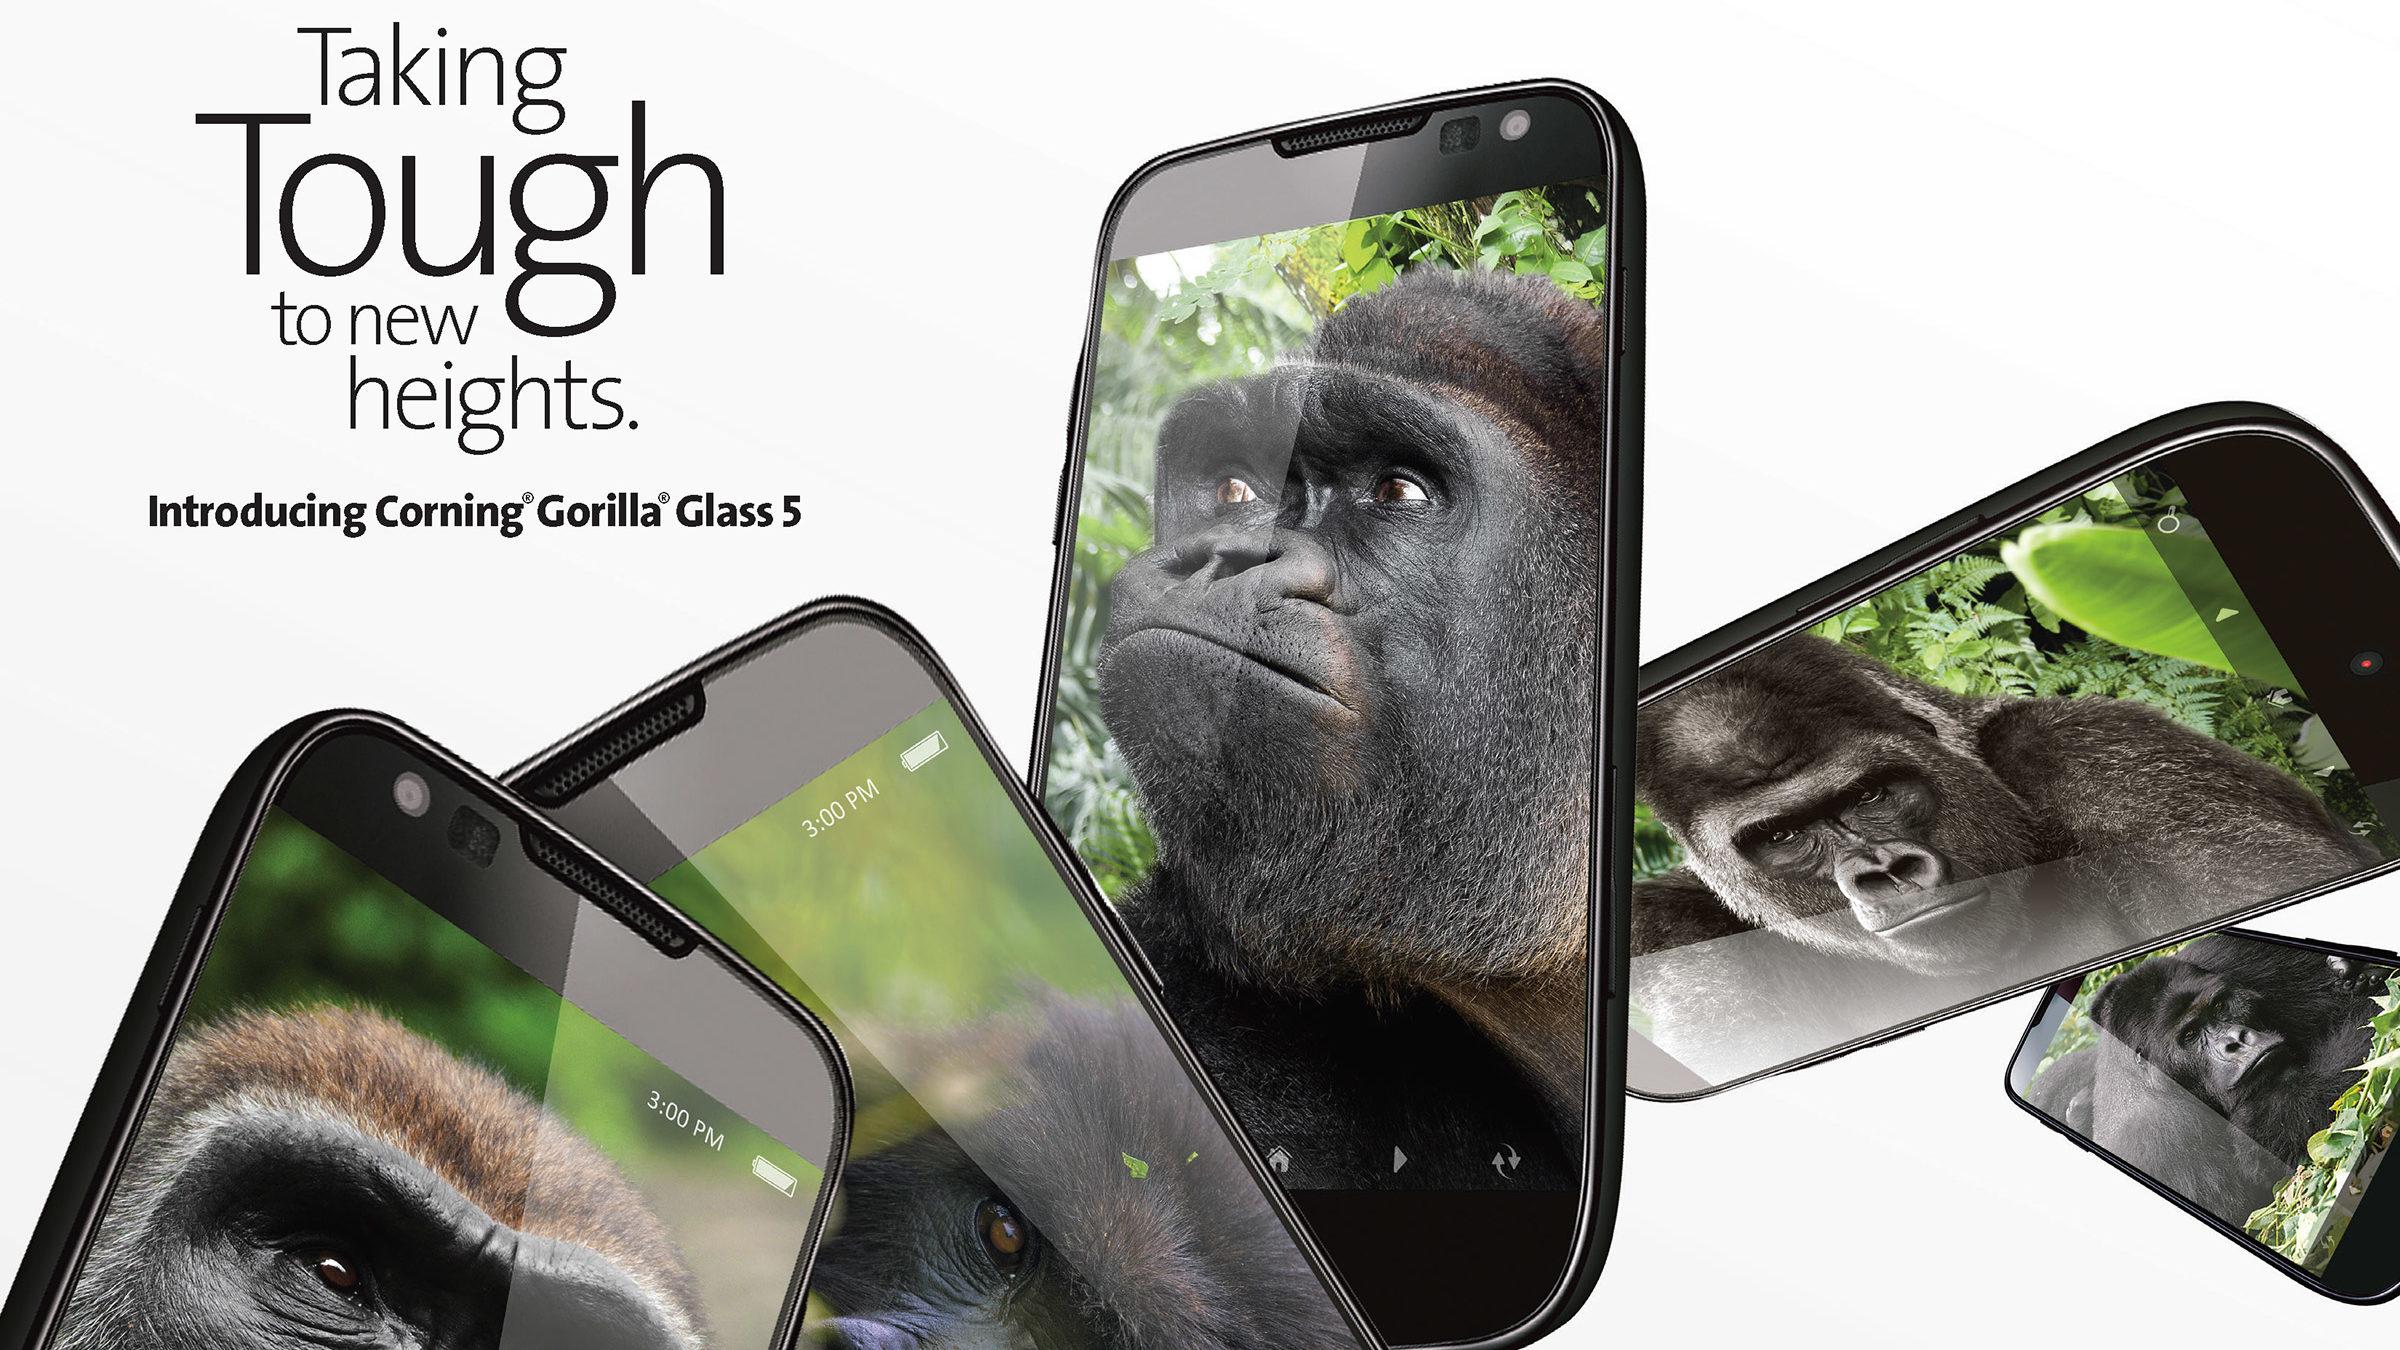 I høst kommer Gorilla Glass 5.